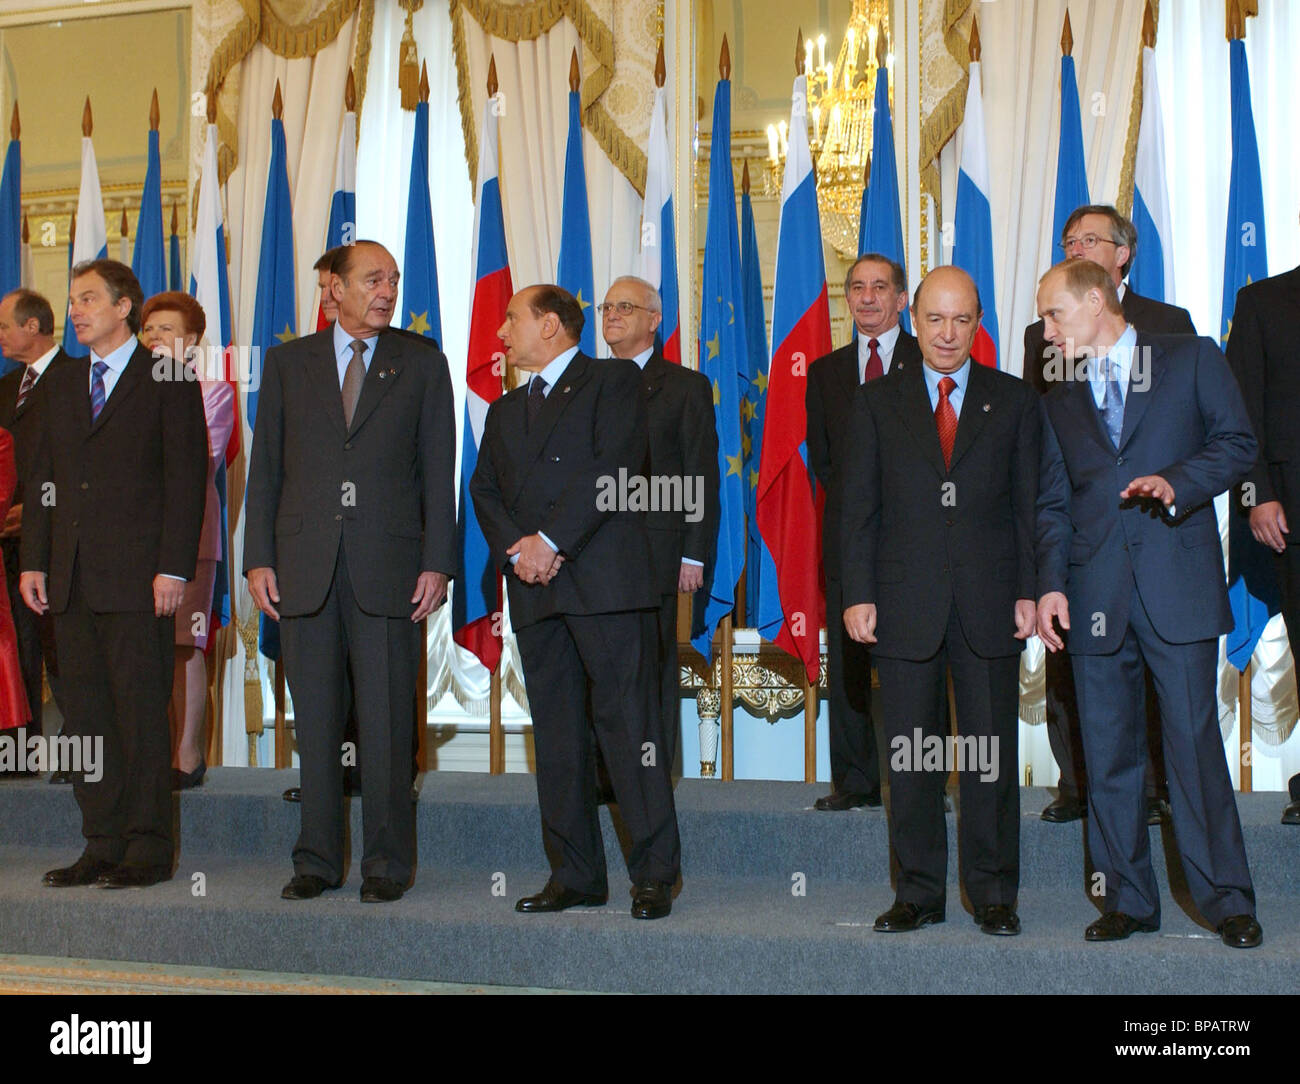 Russia-EU summit opens in Strelnya - Stock Image